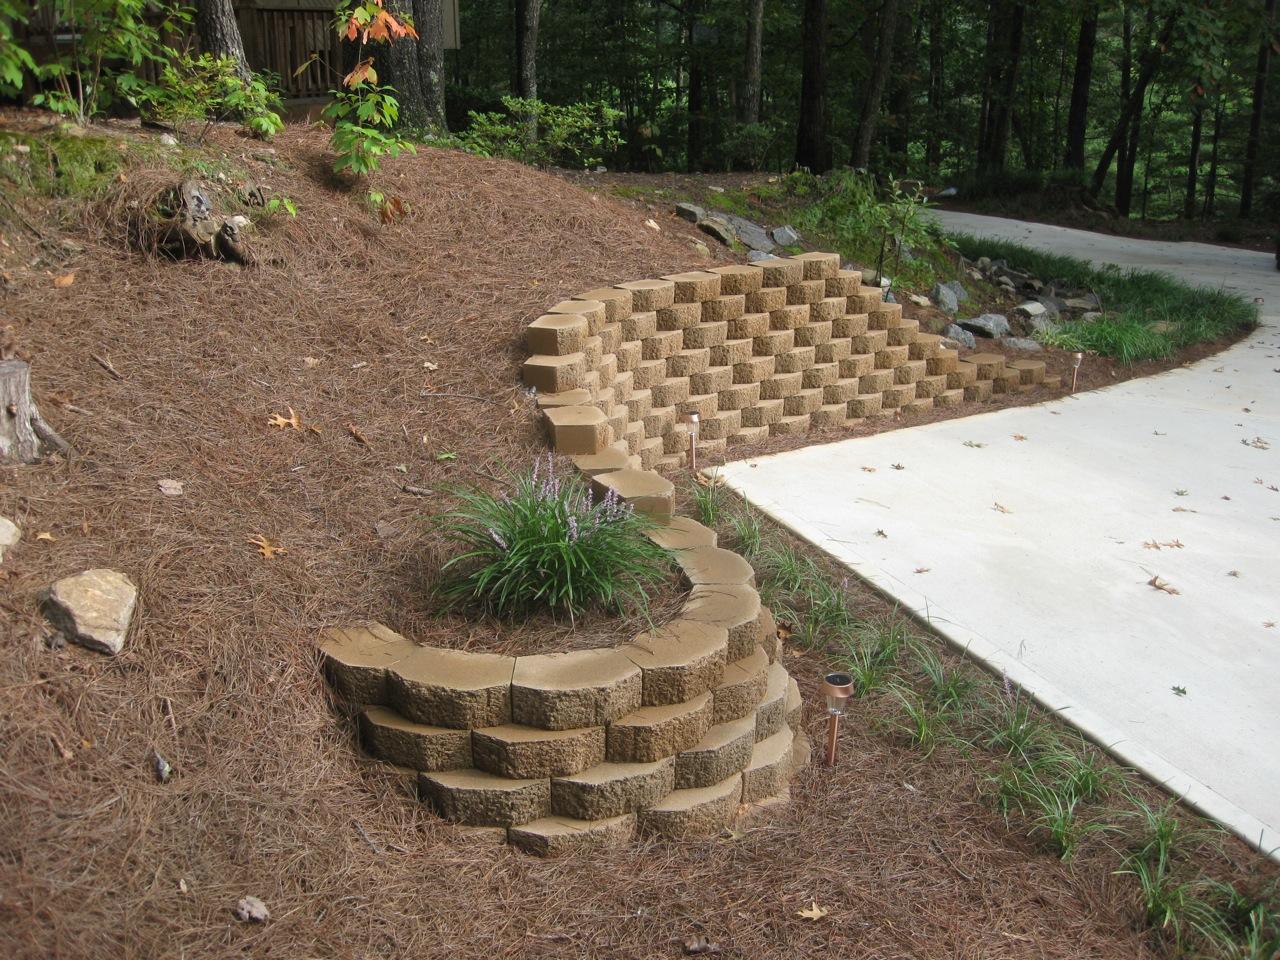 The fagenstrom co garden wall block great falls mt for Garden block wall ideas